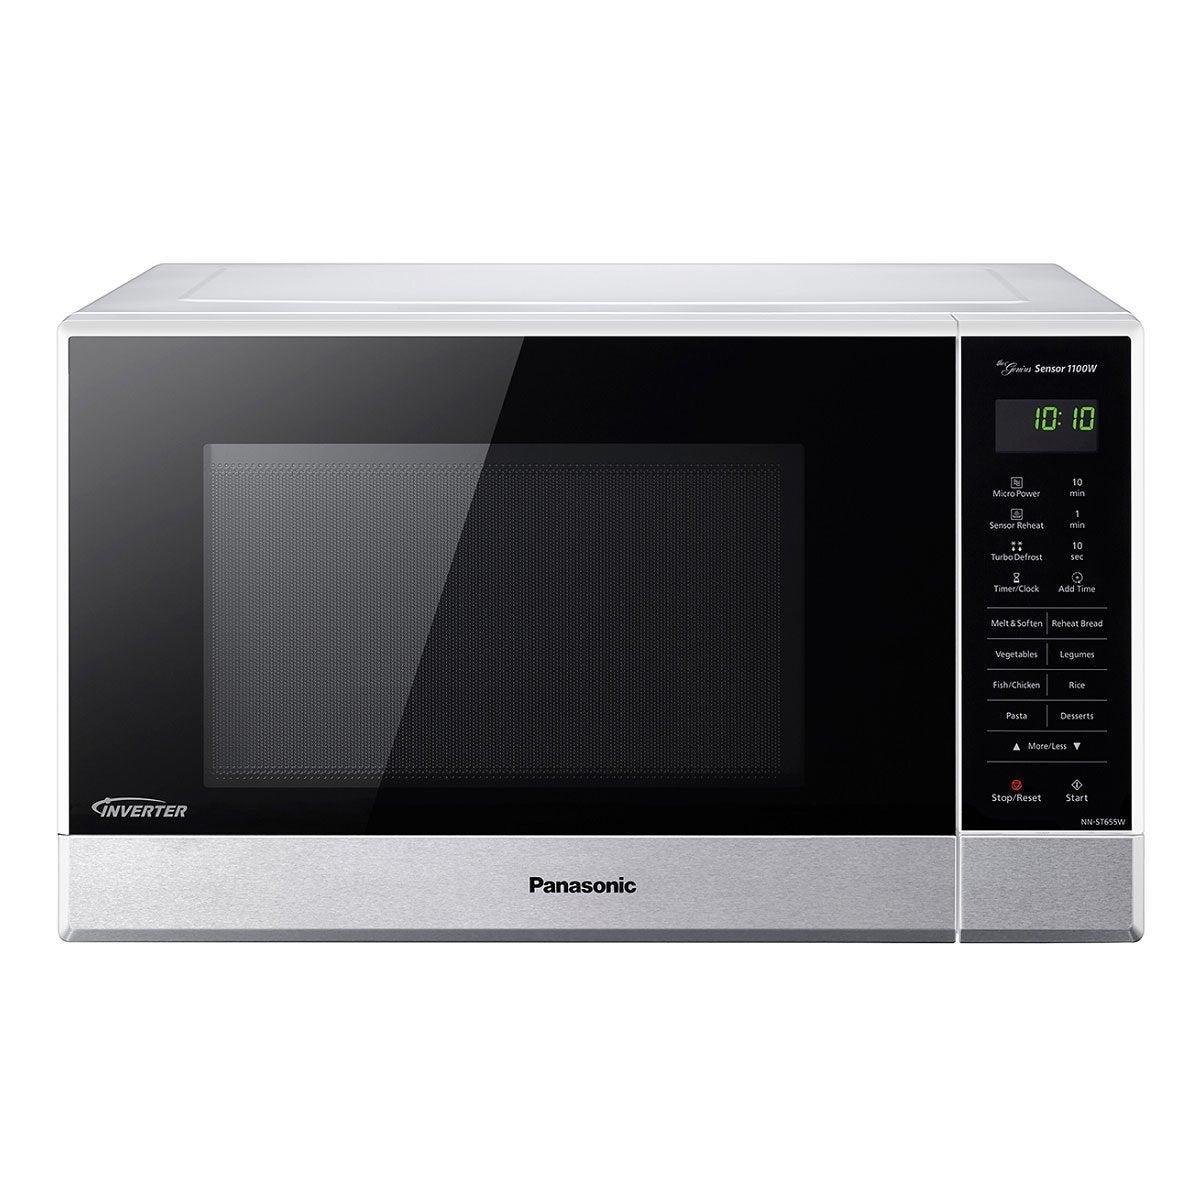 Panasonic NNST655W Microwave